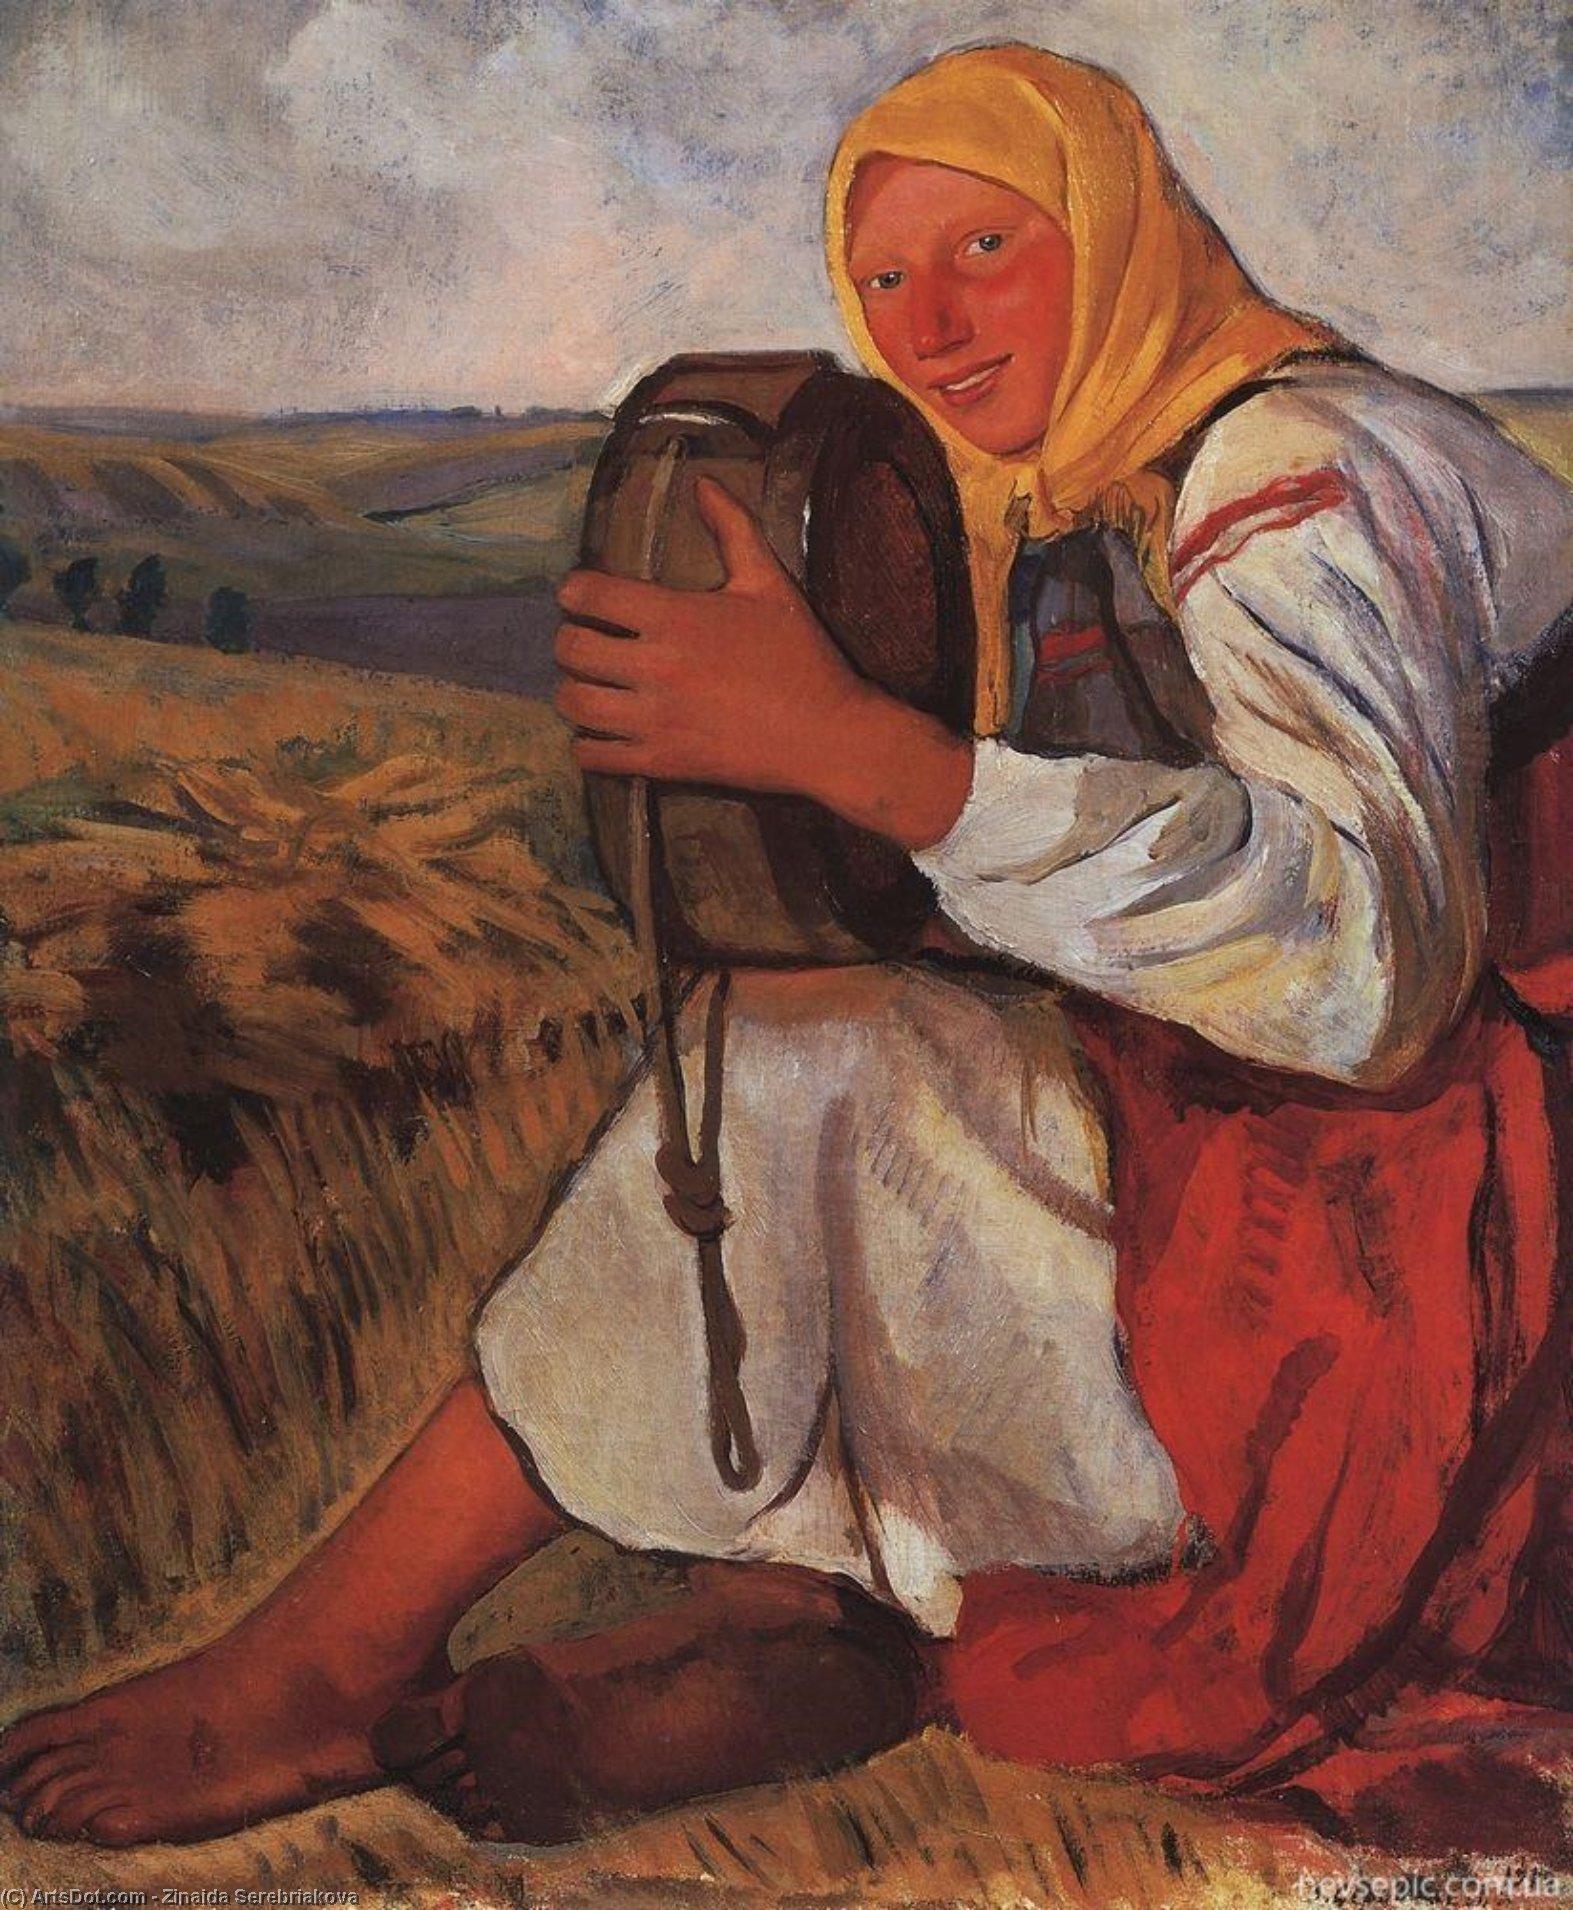 https://en.artsdot.com/ADC/Art-ImgScreen-2.nsf/O/A-8XZ8N5/$FILE/Zinaida_serebriakova-peasant.Jpg